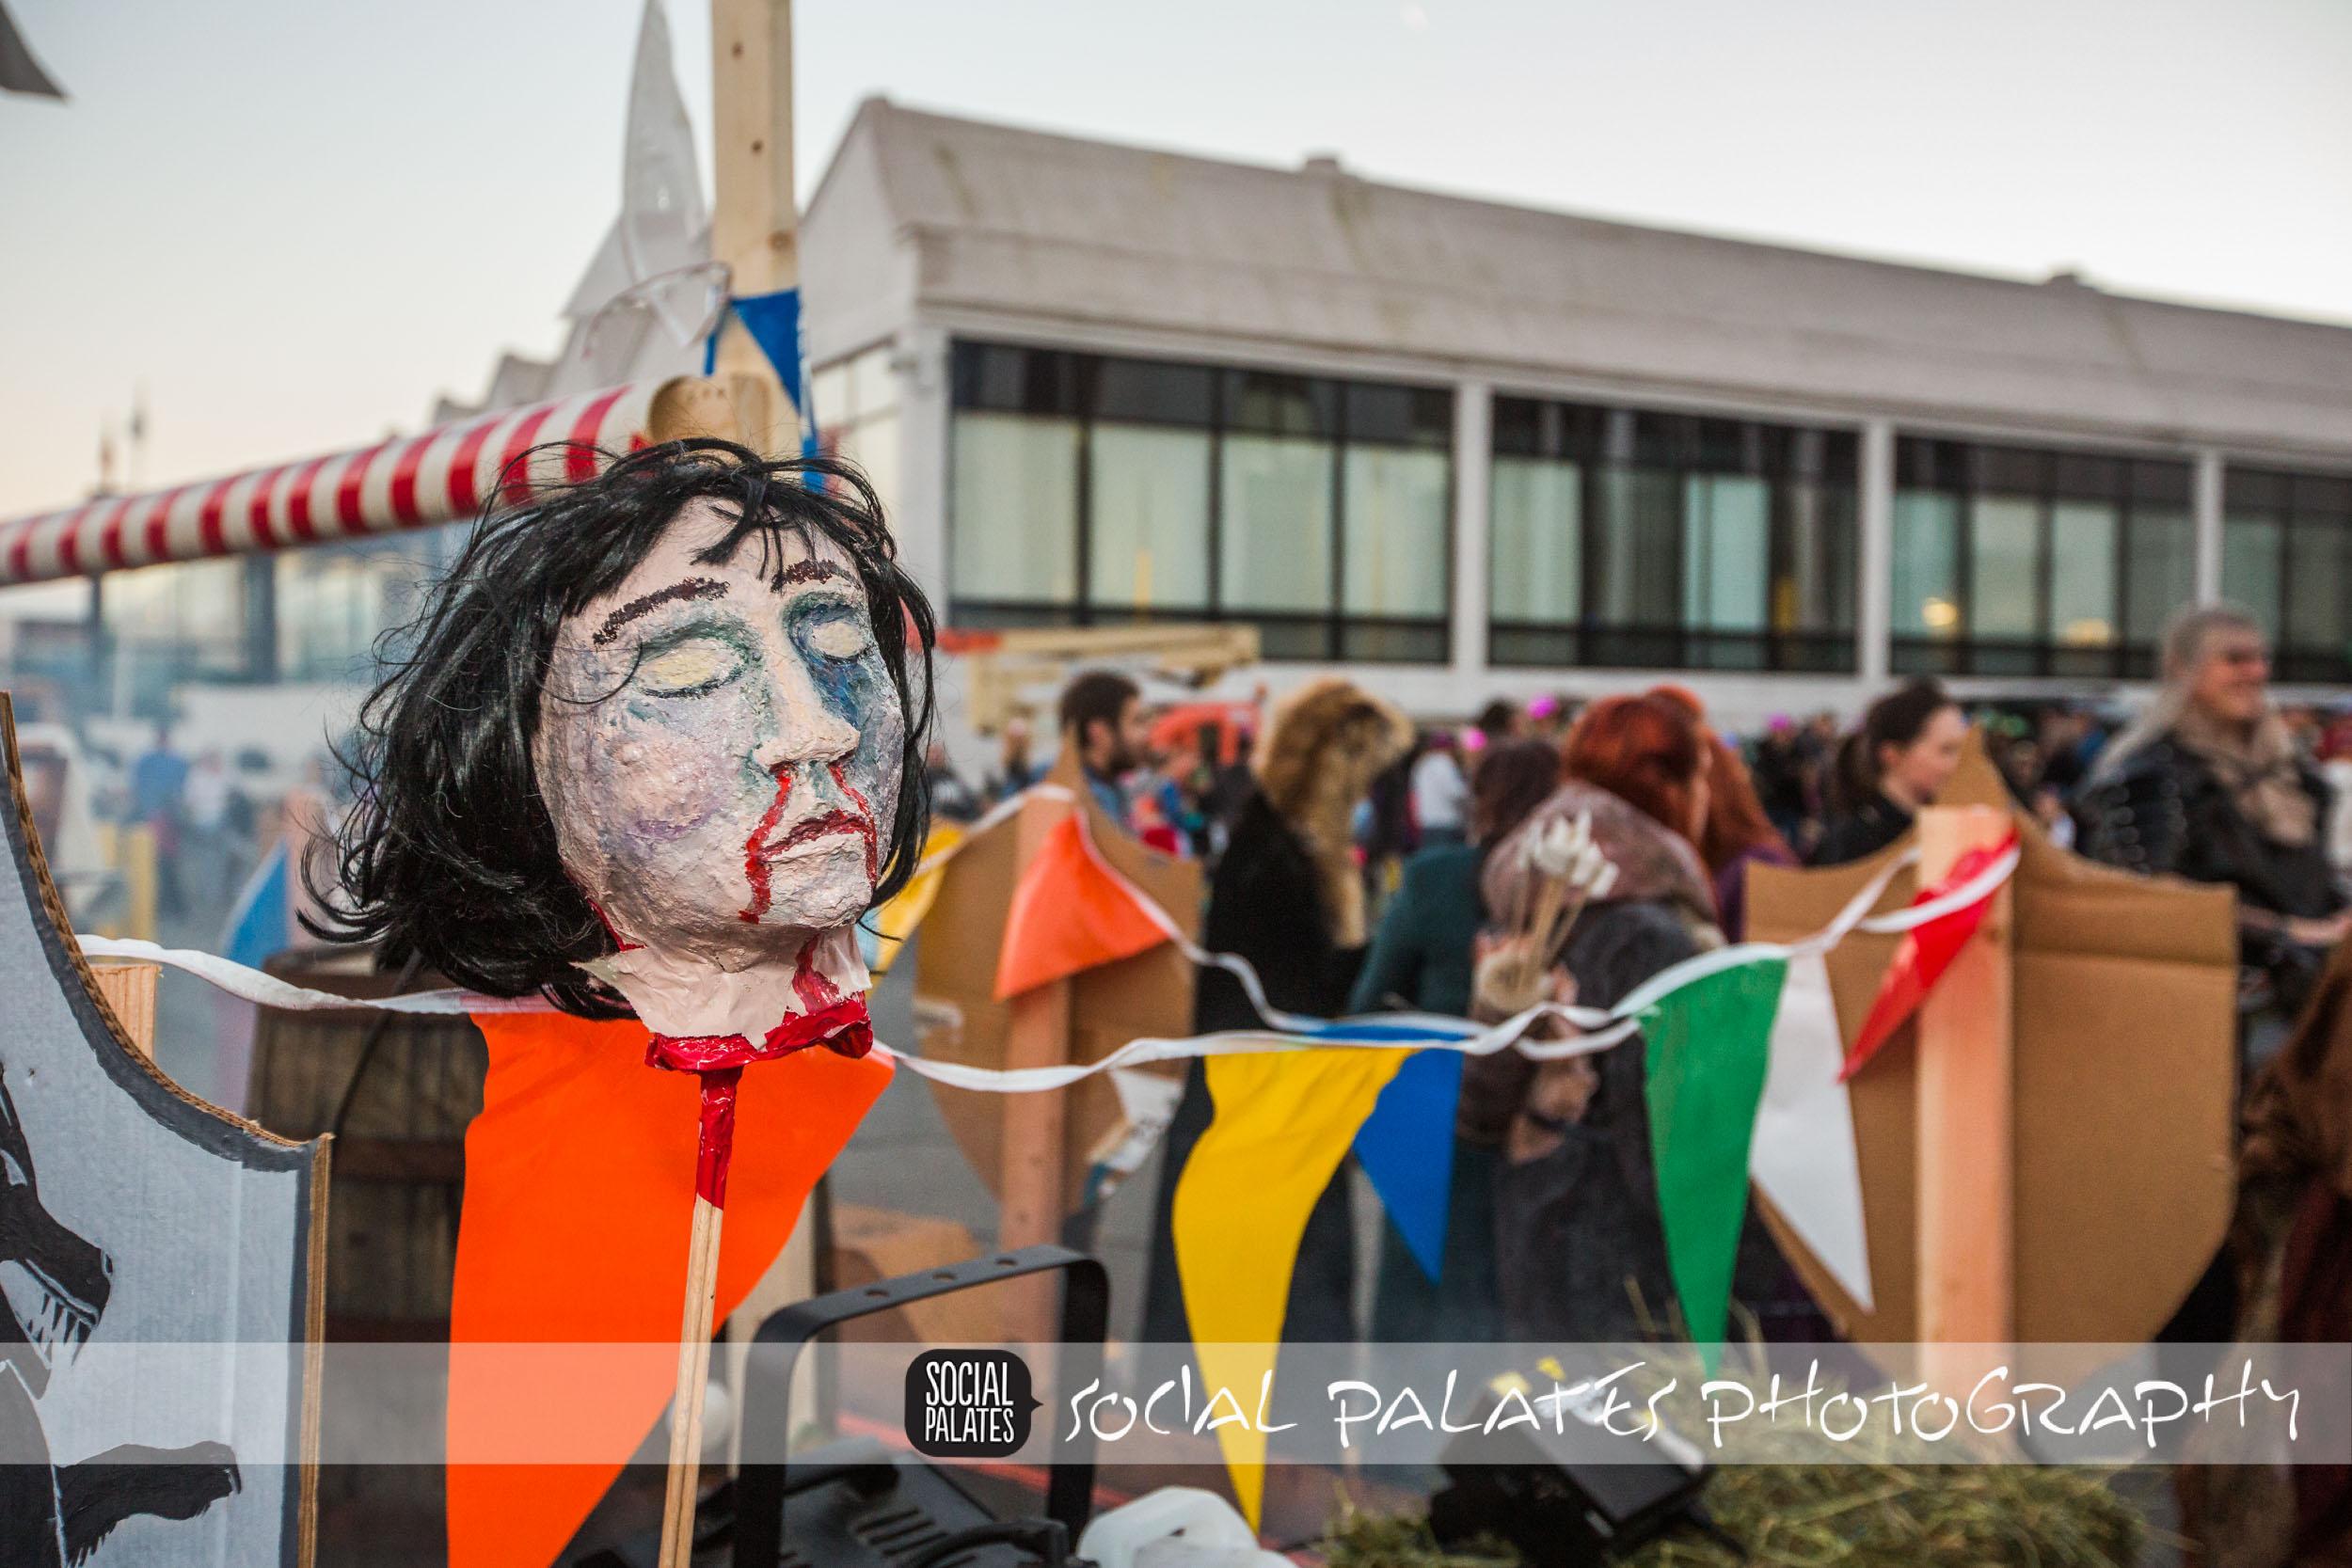 Haunted Happenings Parade 2014 Creative Salem by Social Palates-7283.jpg